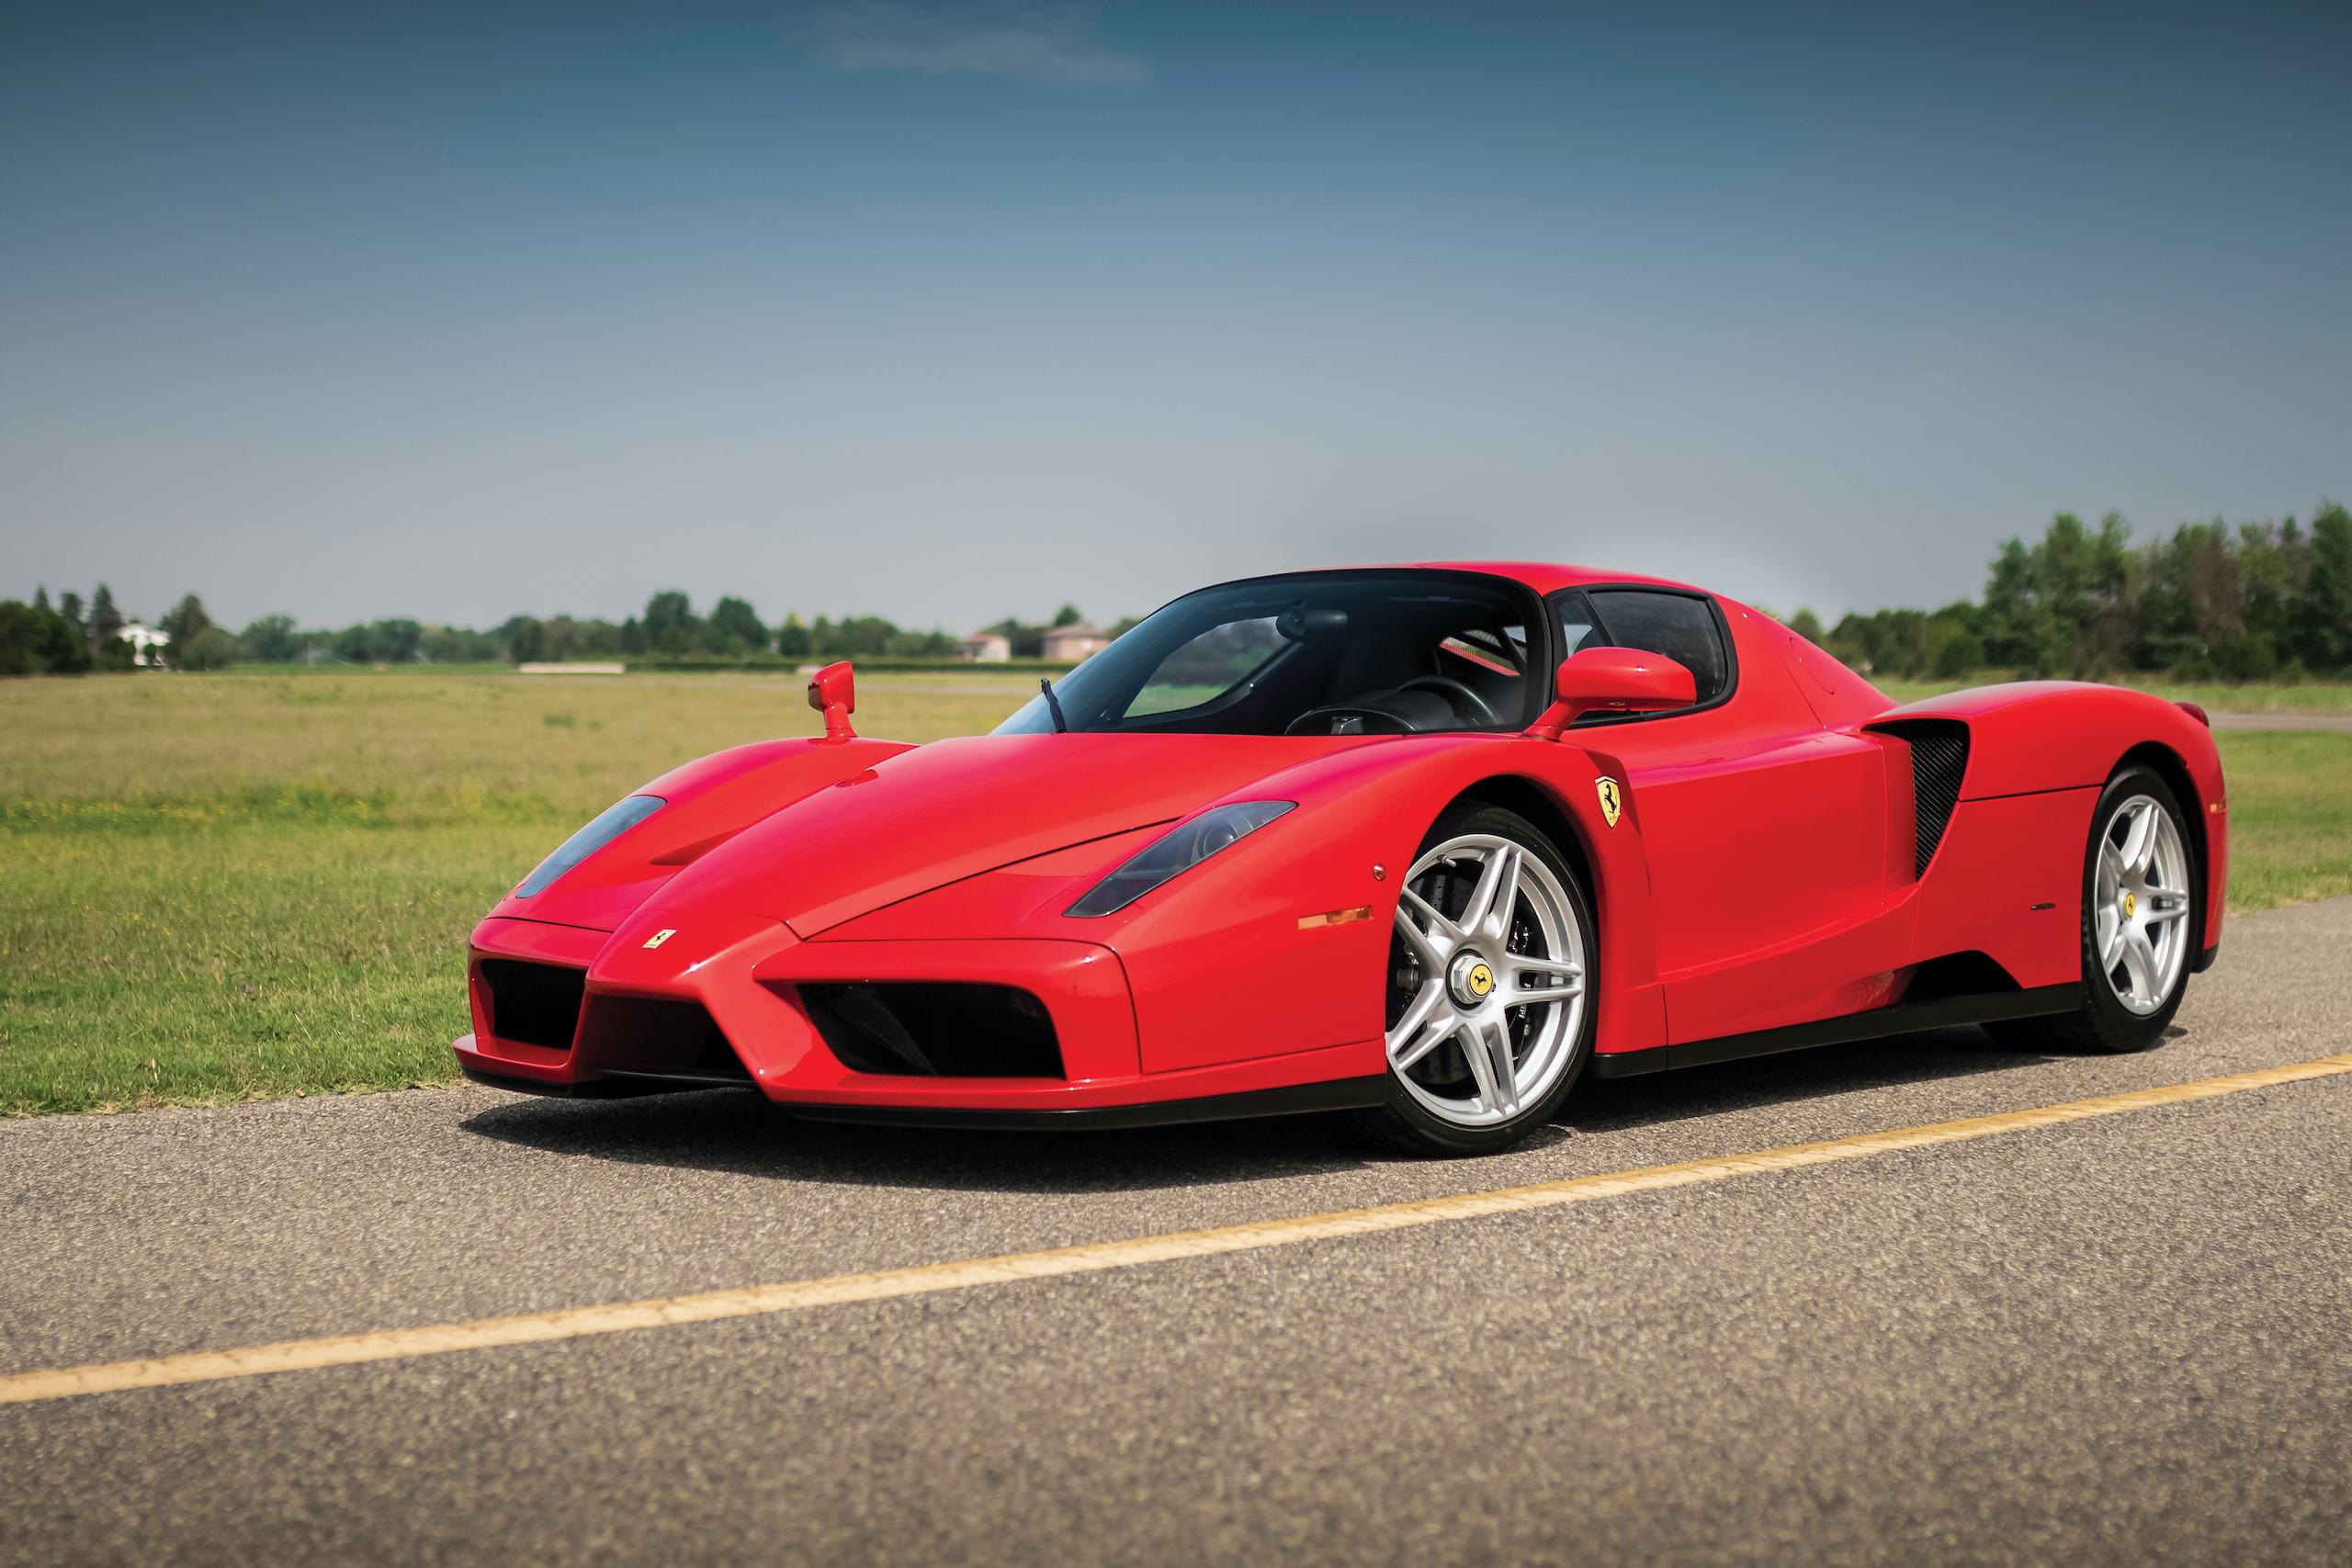 2003 Ferrari Enzo front three-quarter